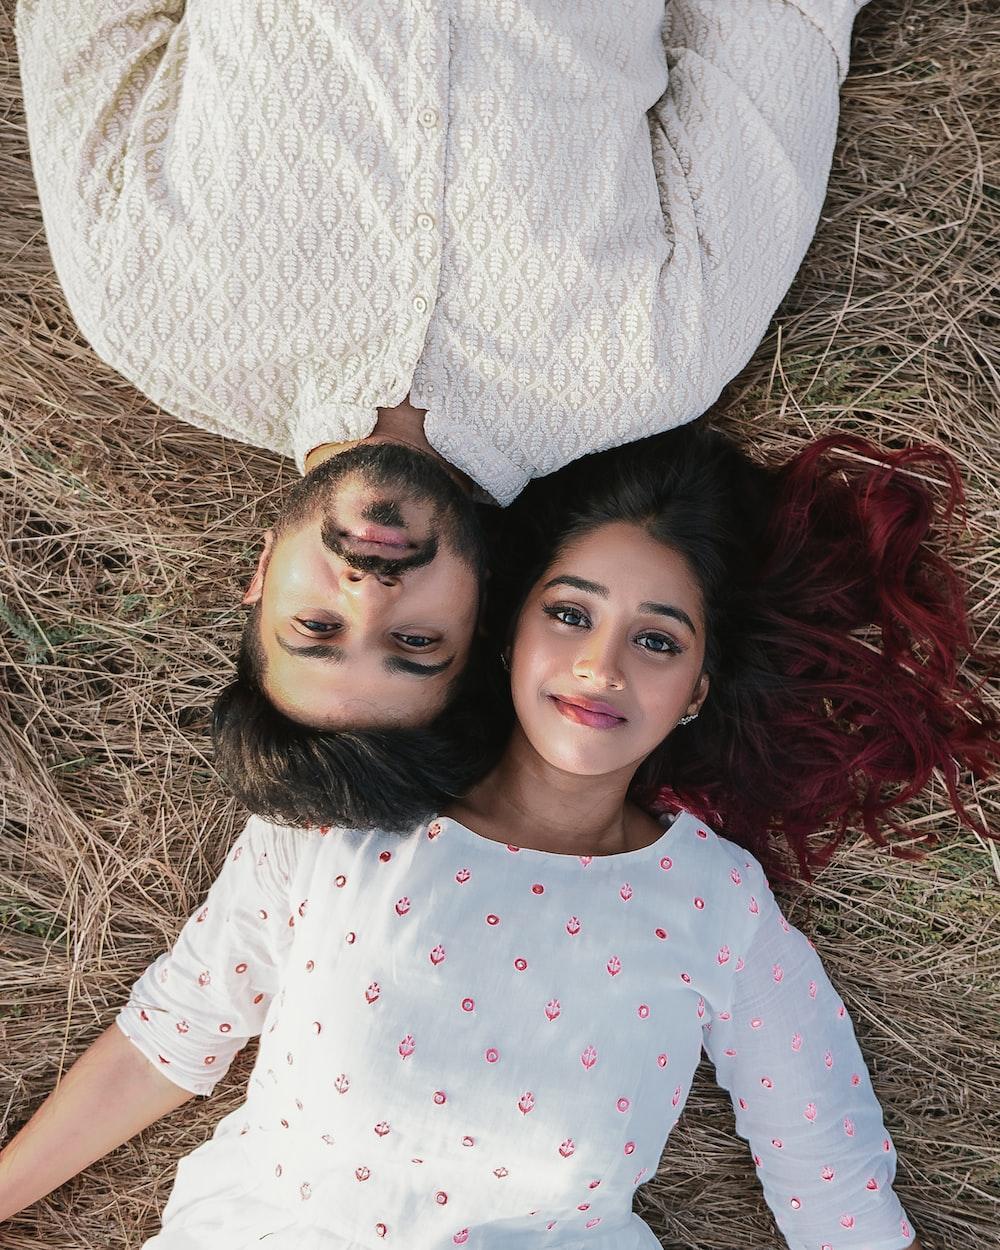 high-angle photography of woman and man lying on brown grass